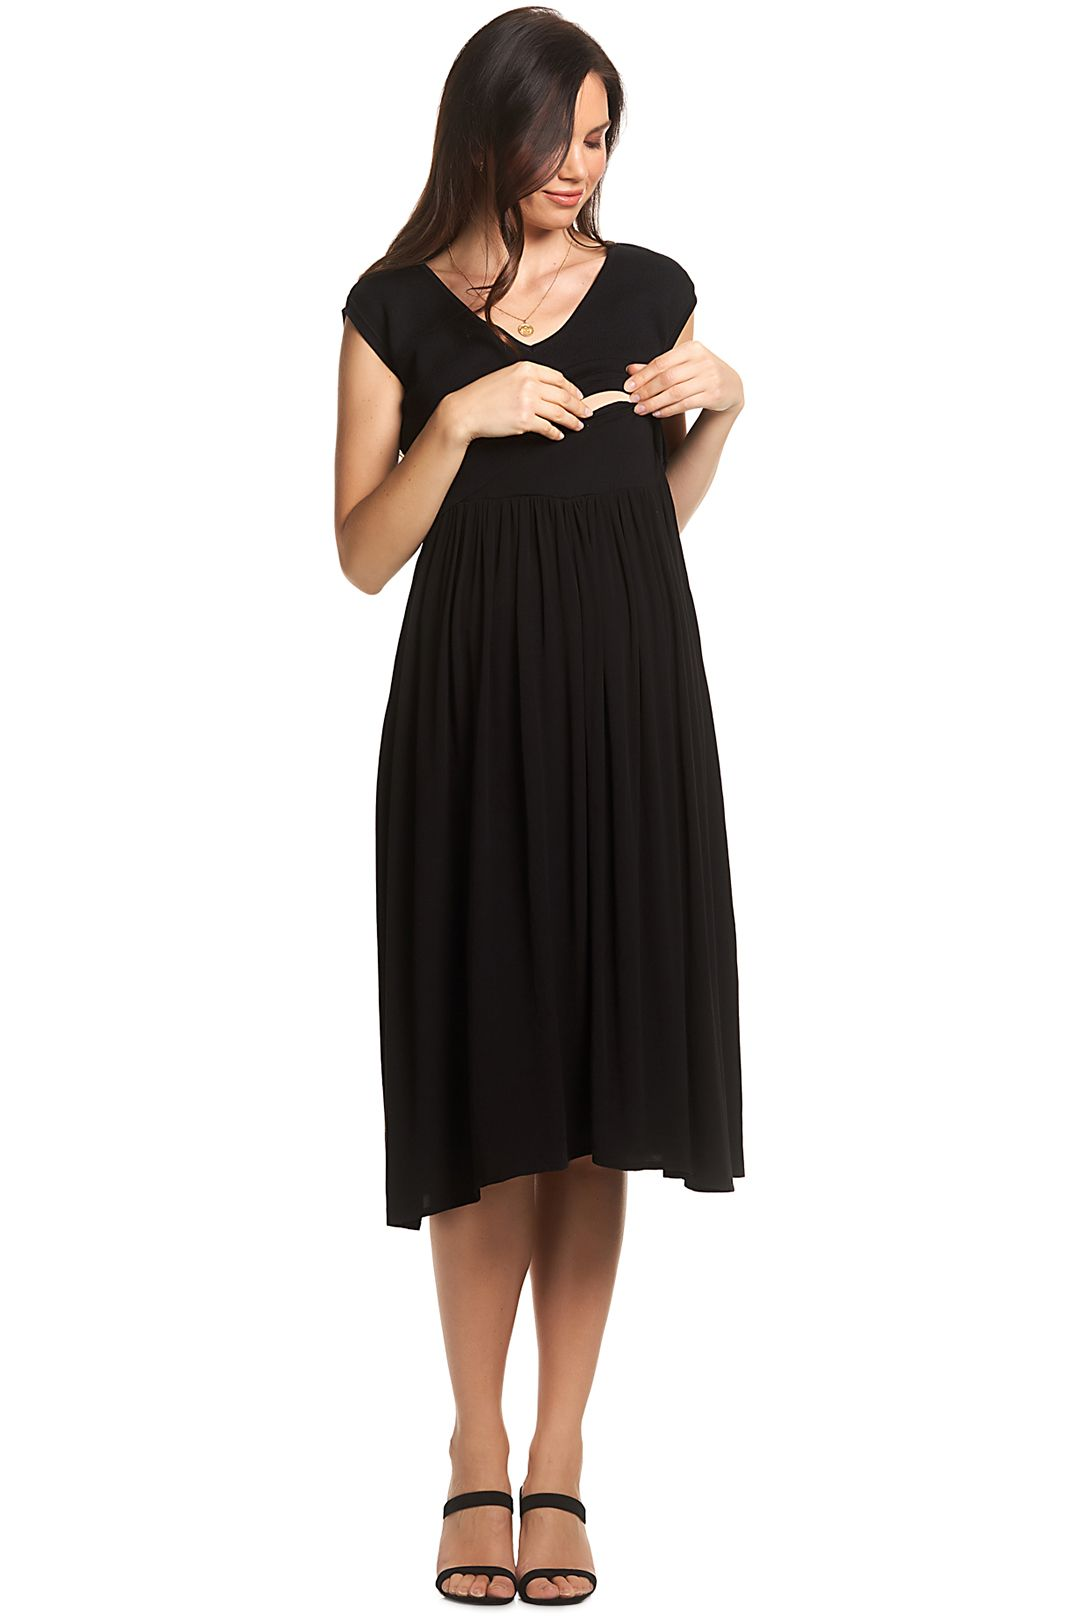 Soon-Maternity-Francis-Feeding-Midi-Dress-Black-Front-Two